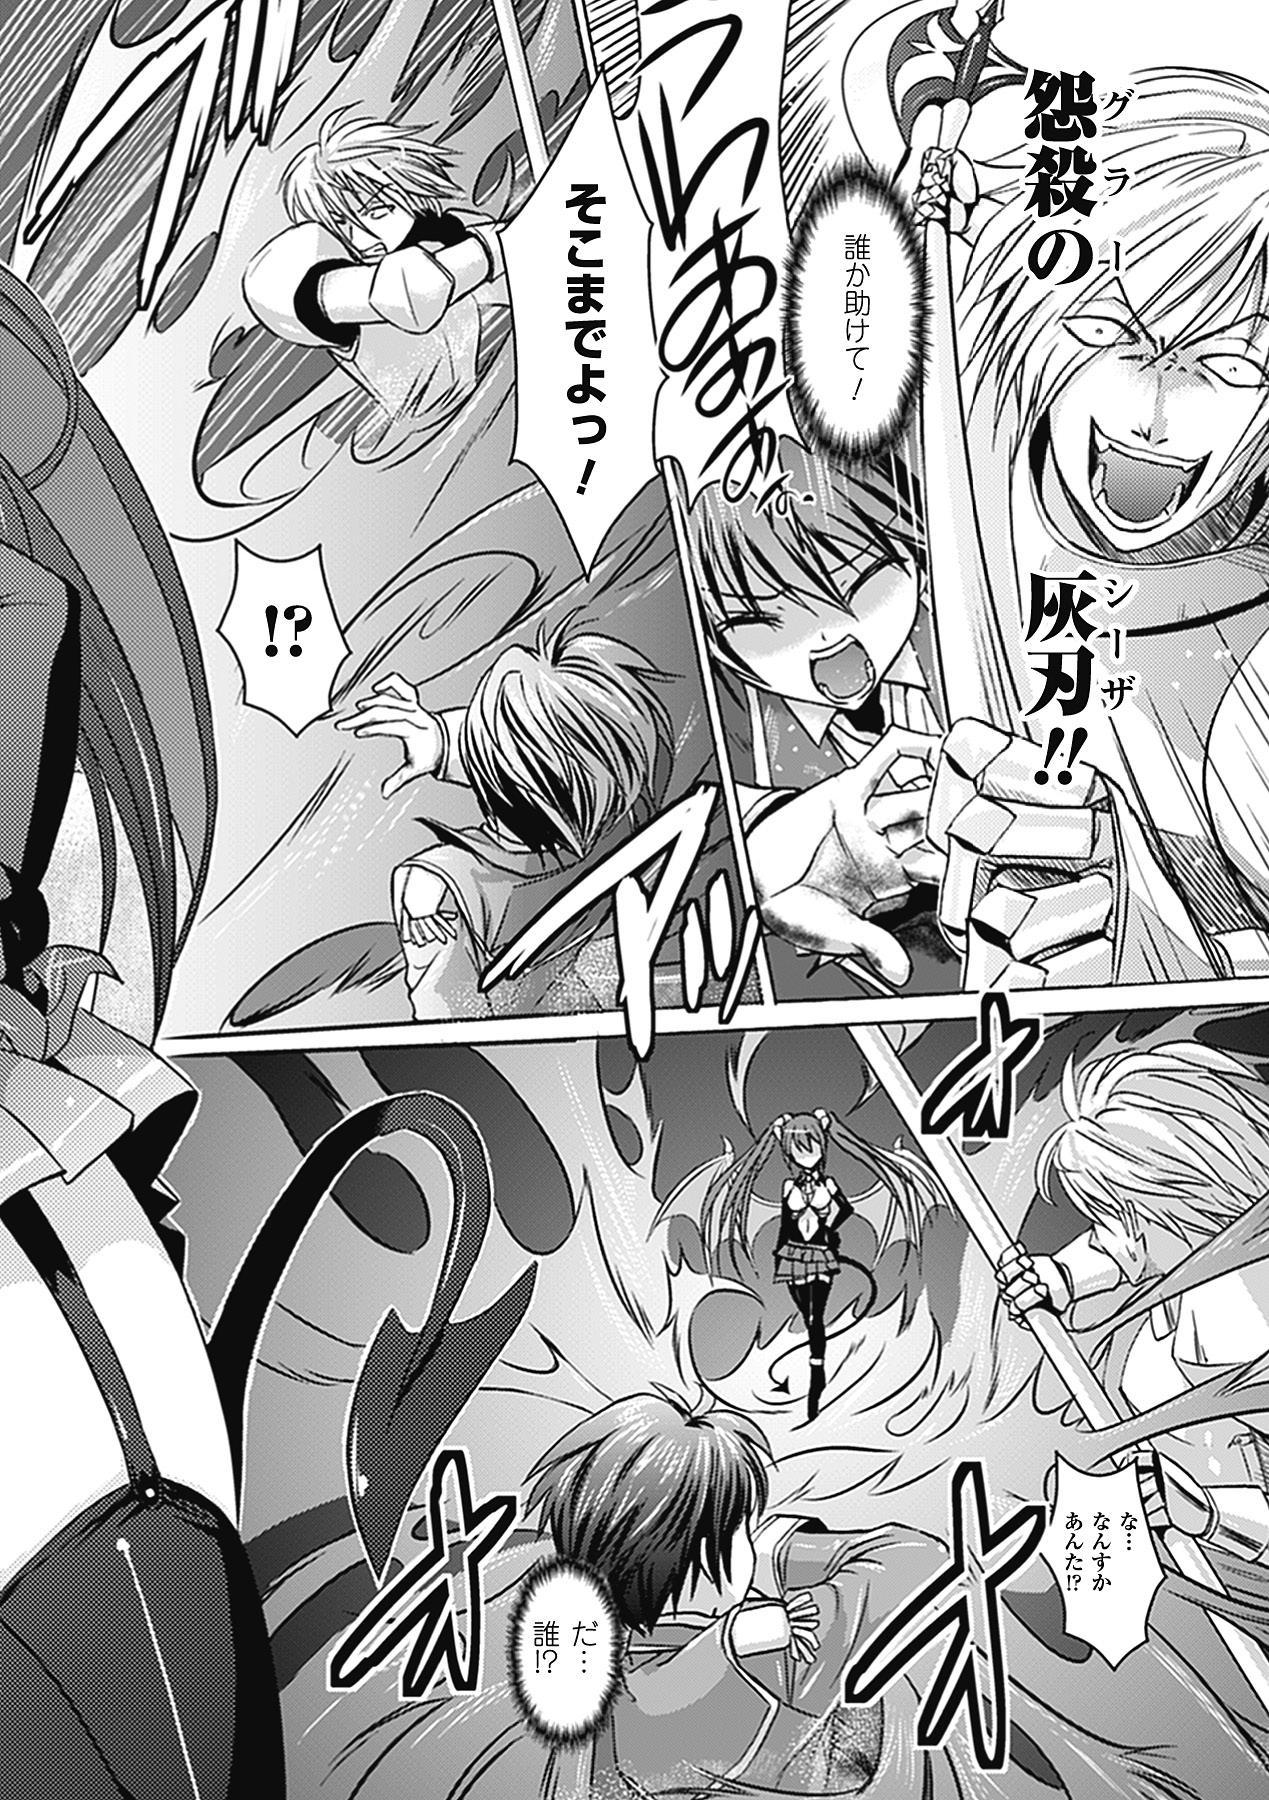 Megami Crisis 5 43